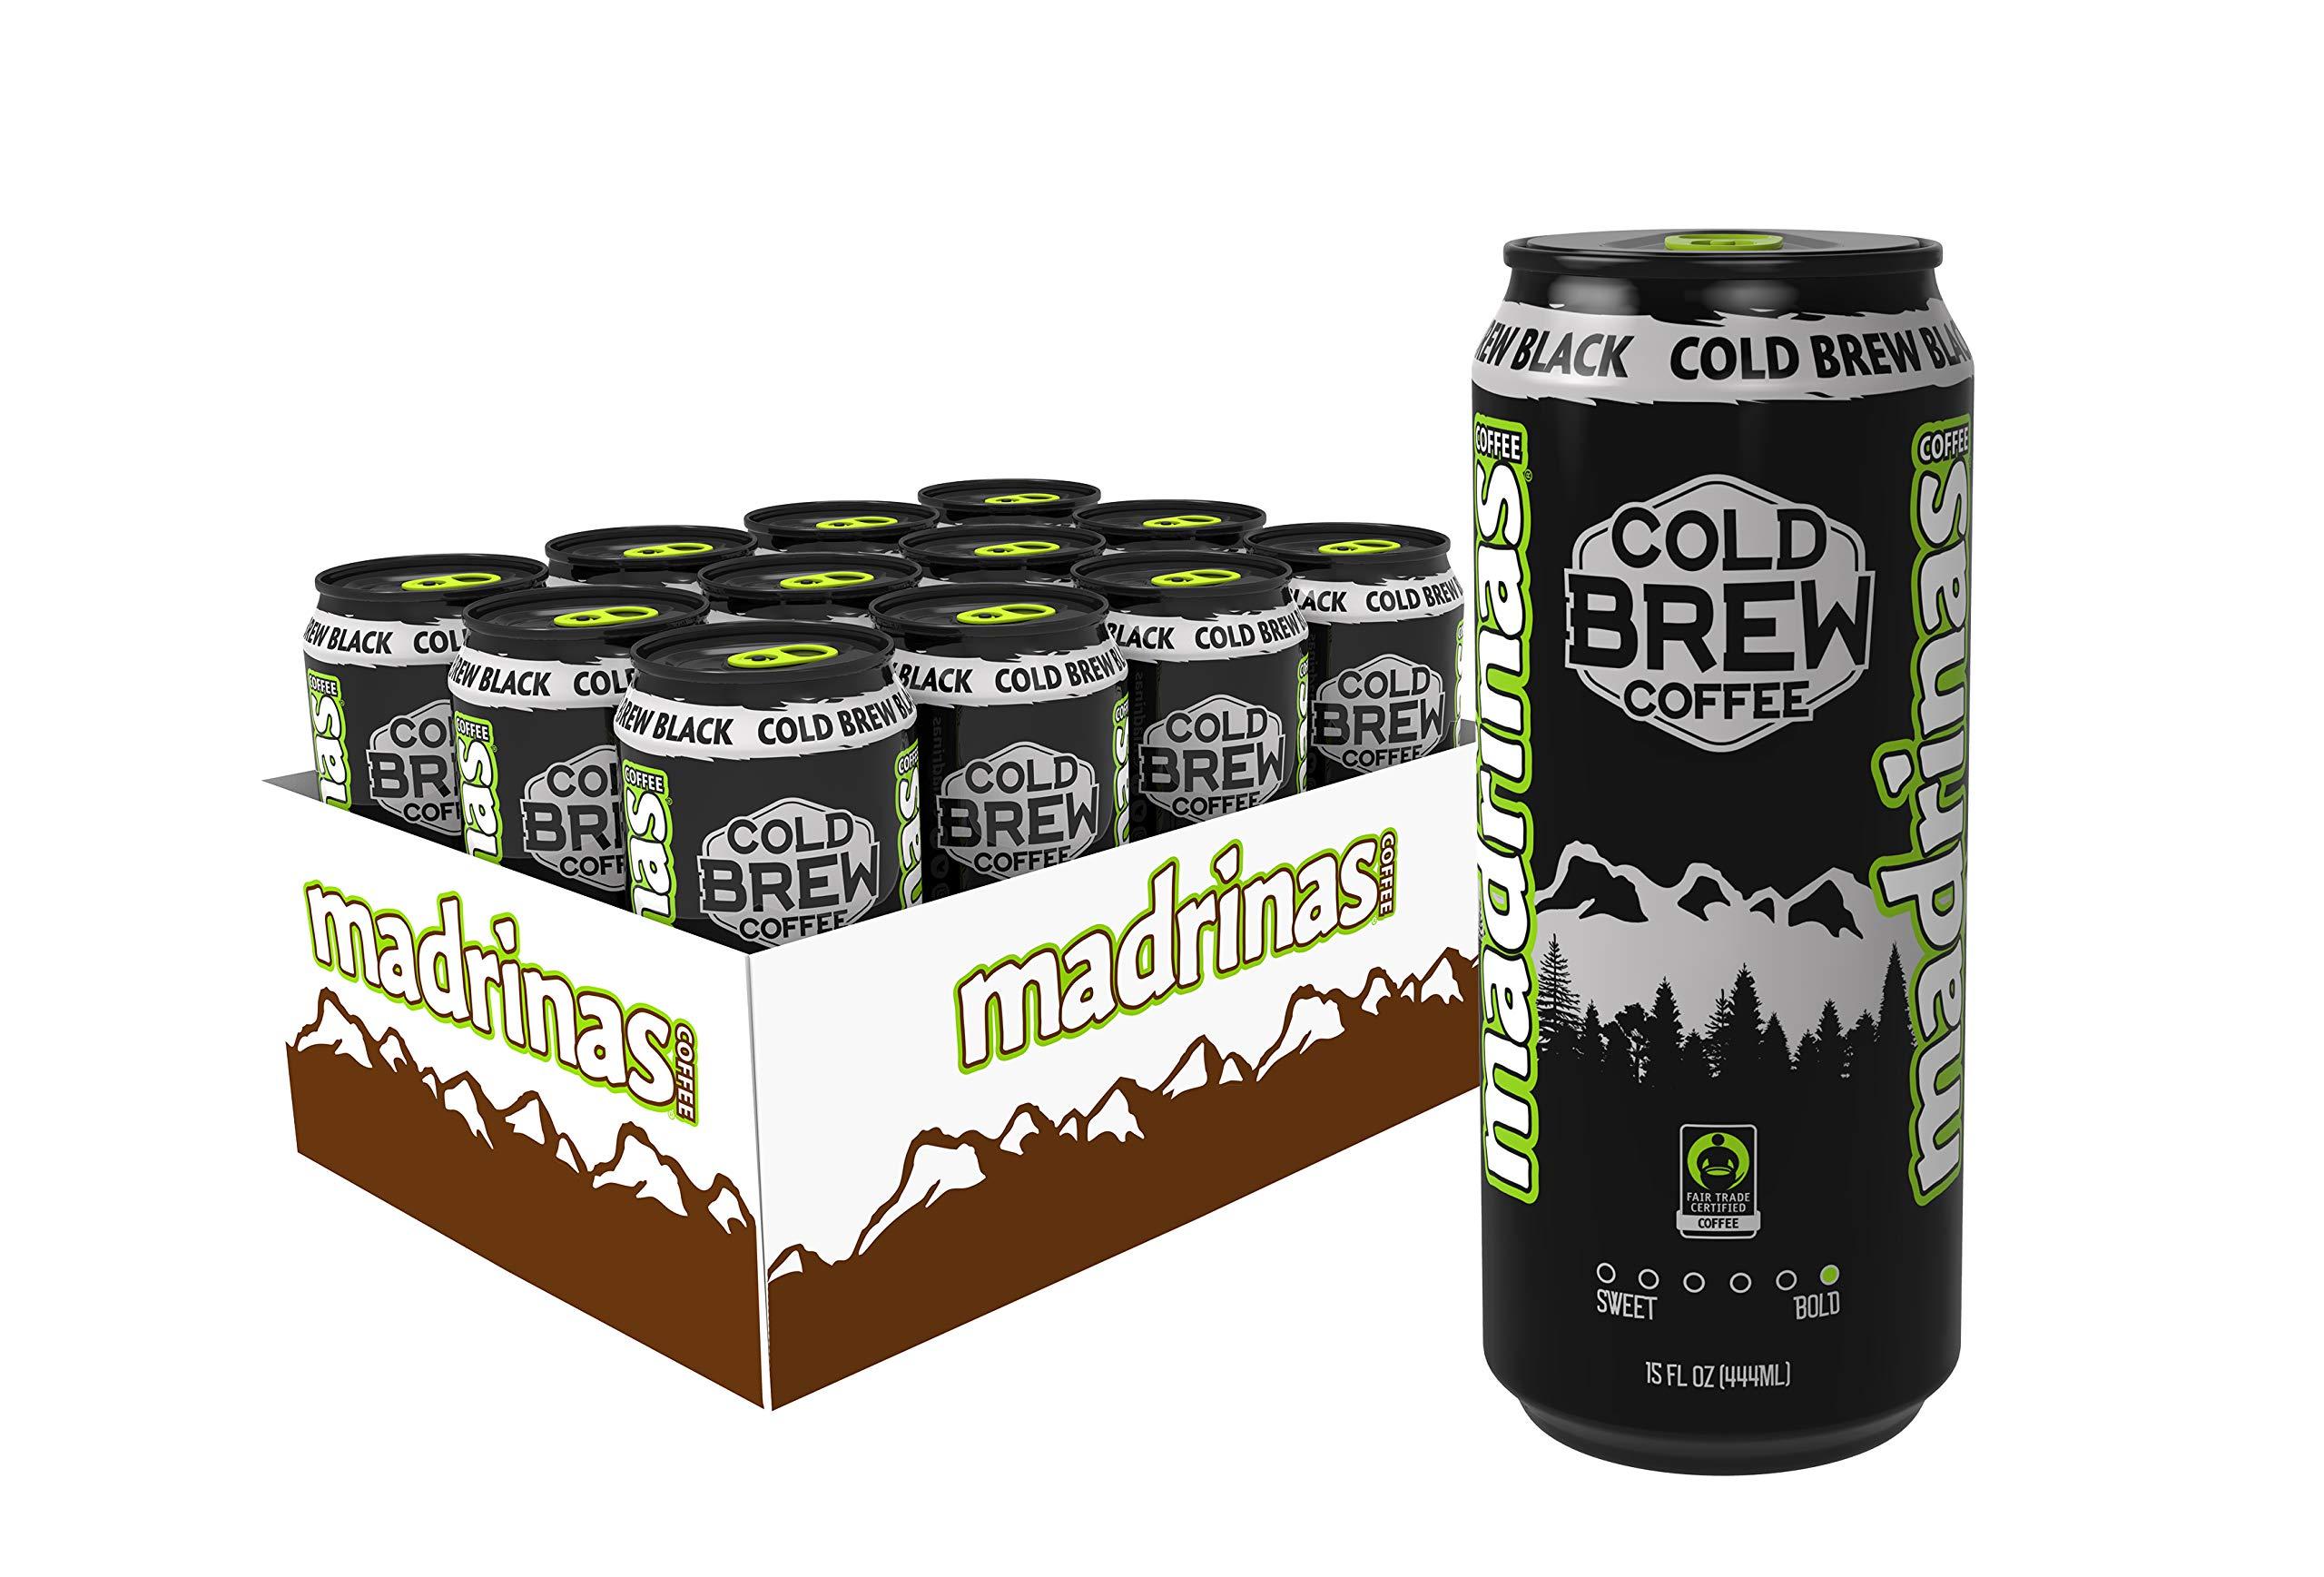 Madrinas Coffee Fair Trade Organic Cold Brew Black, 15 fl oz (Pack of 12) by Madrinas Coffee